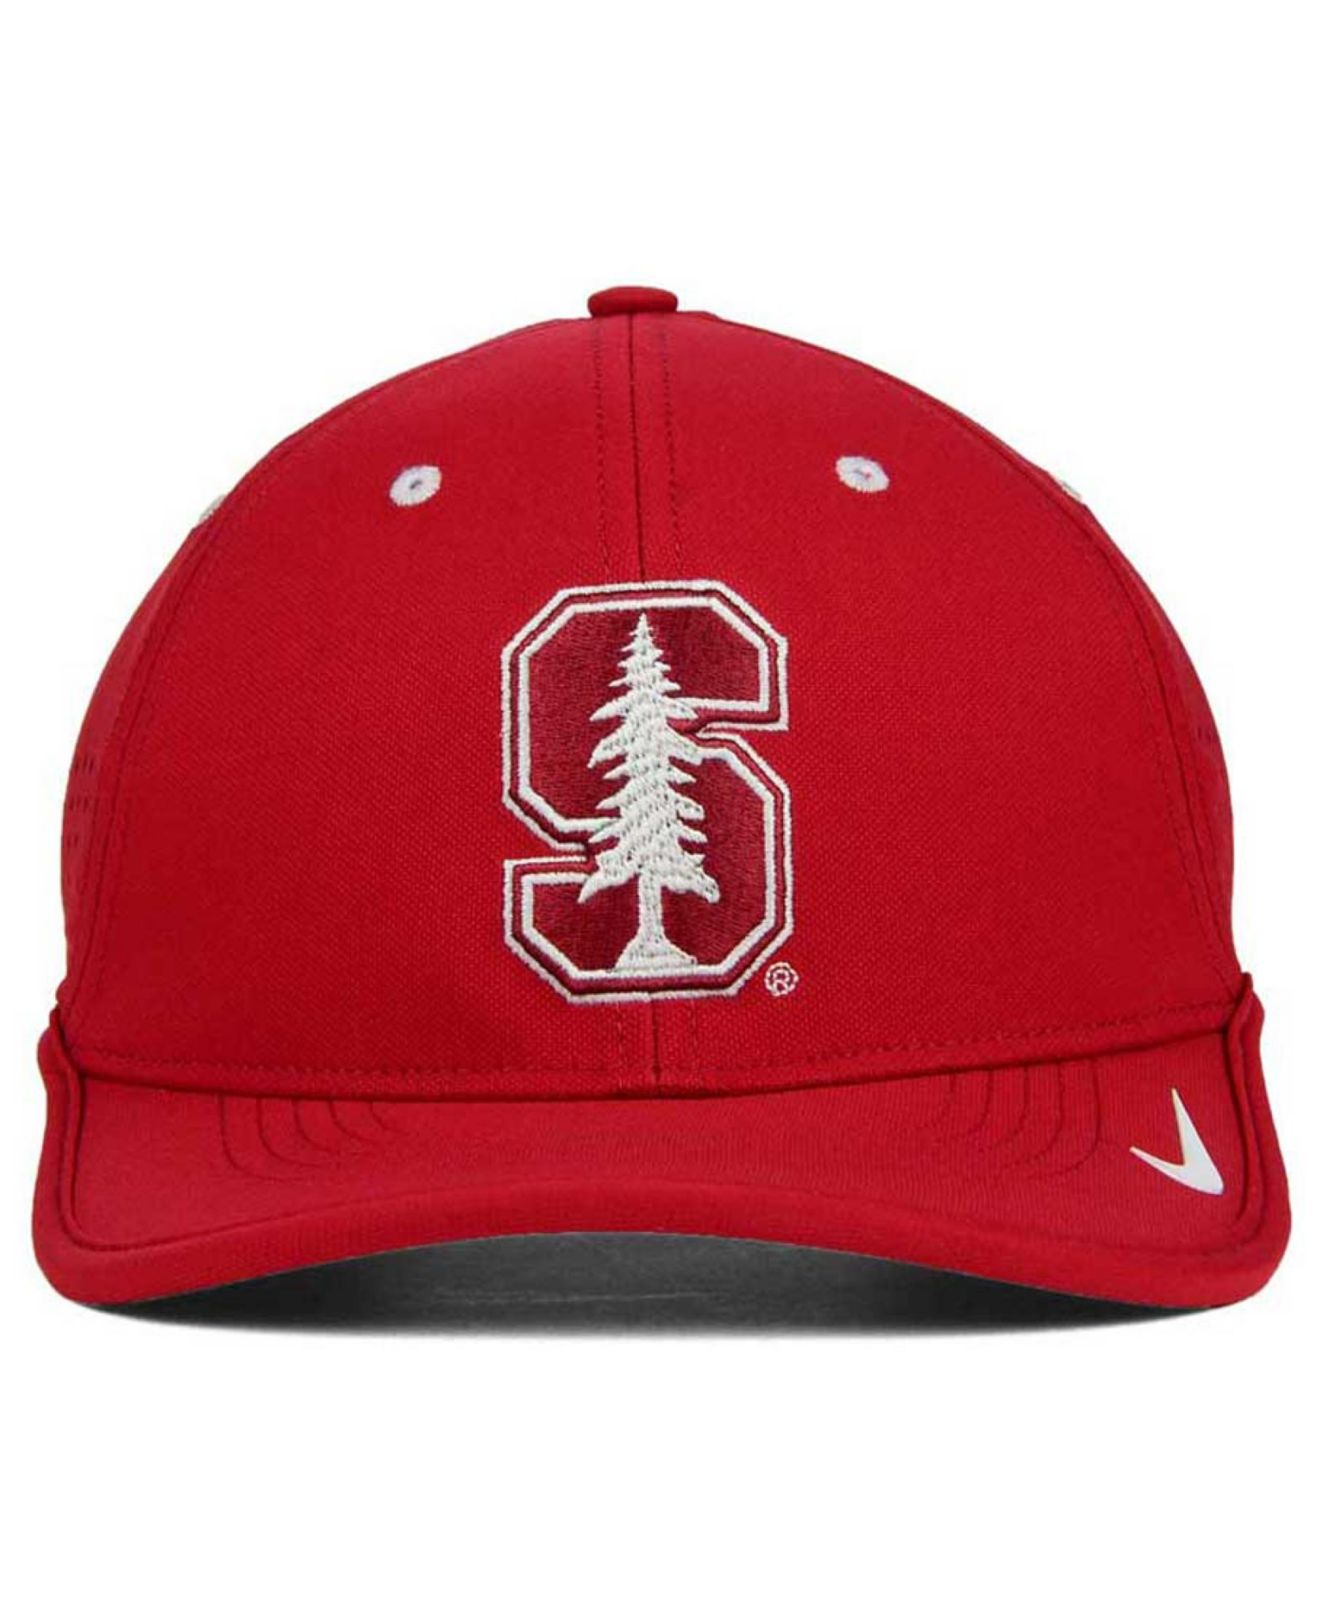 33a752d0ea1 ... best price lyst nike stanford cardinal dri fit coaches cap in red for  men 9c233 dbf25